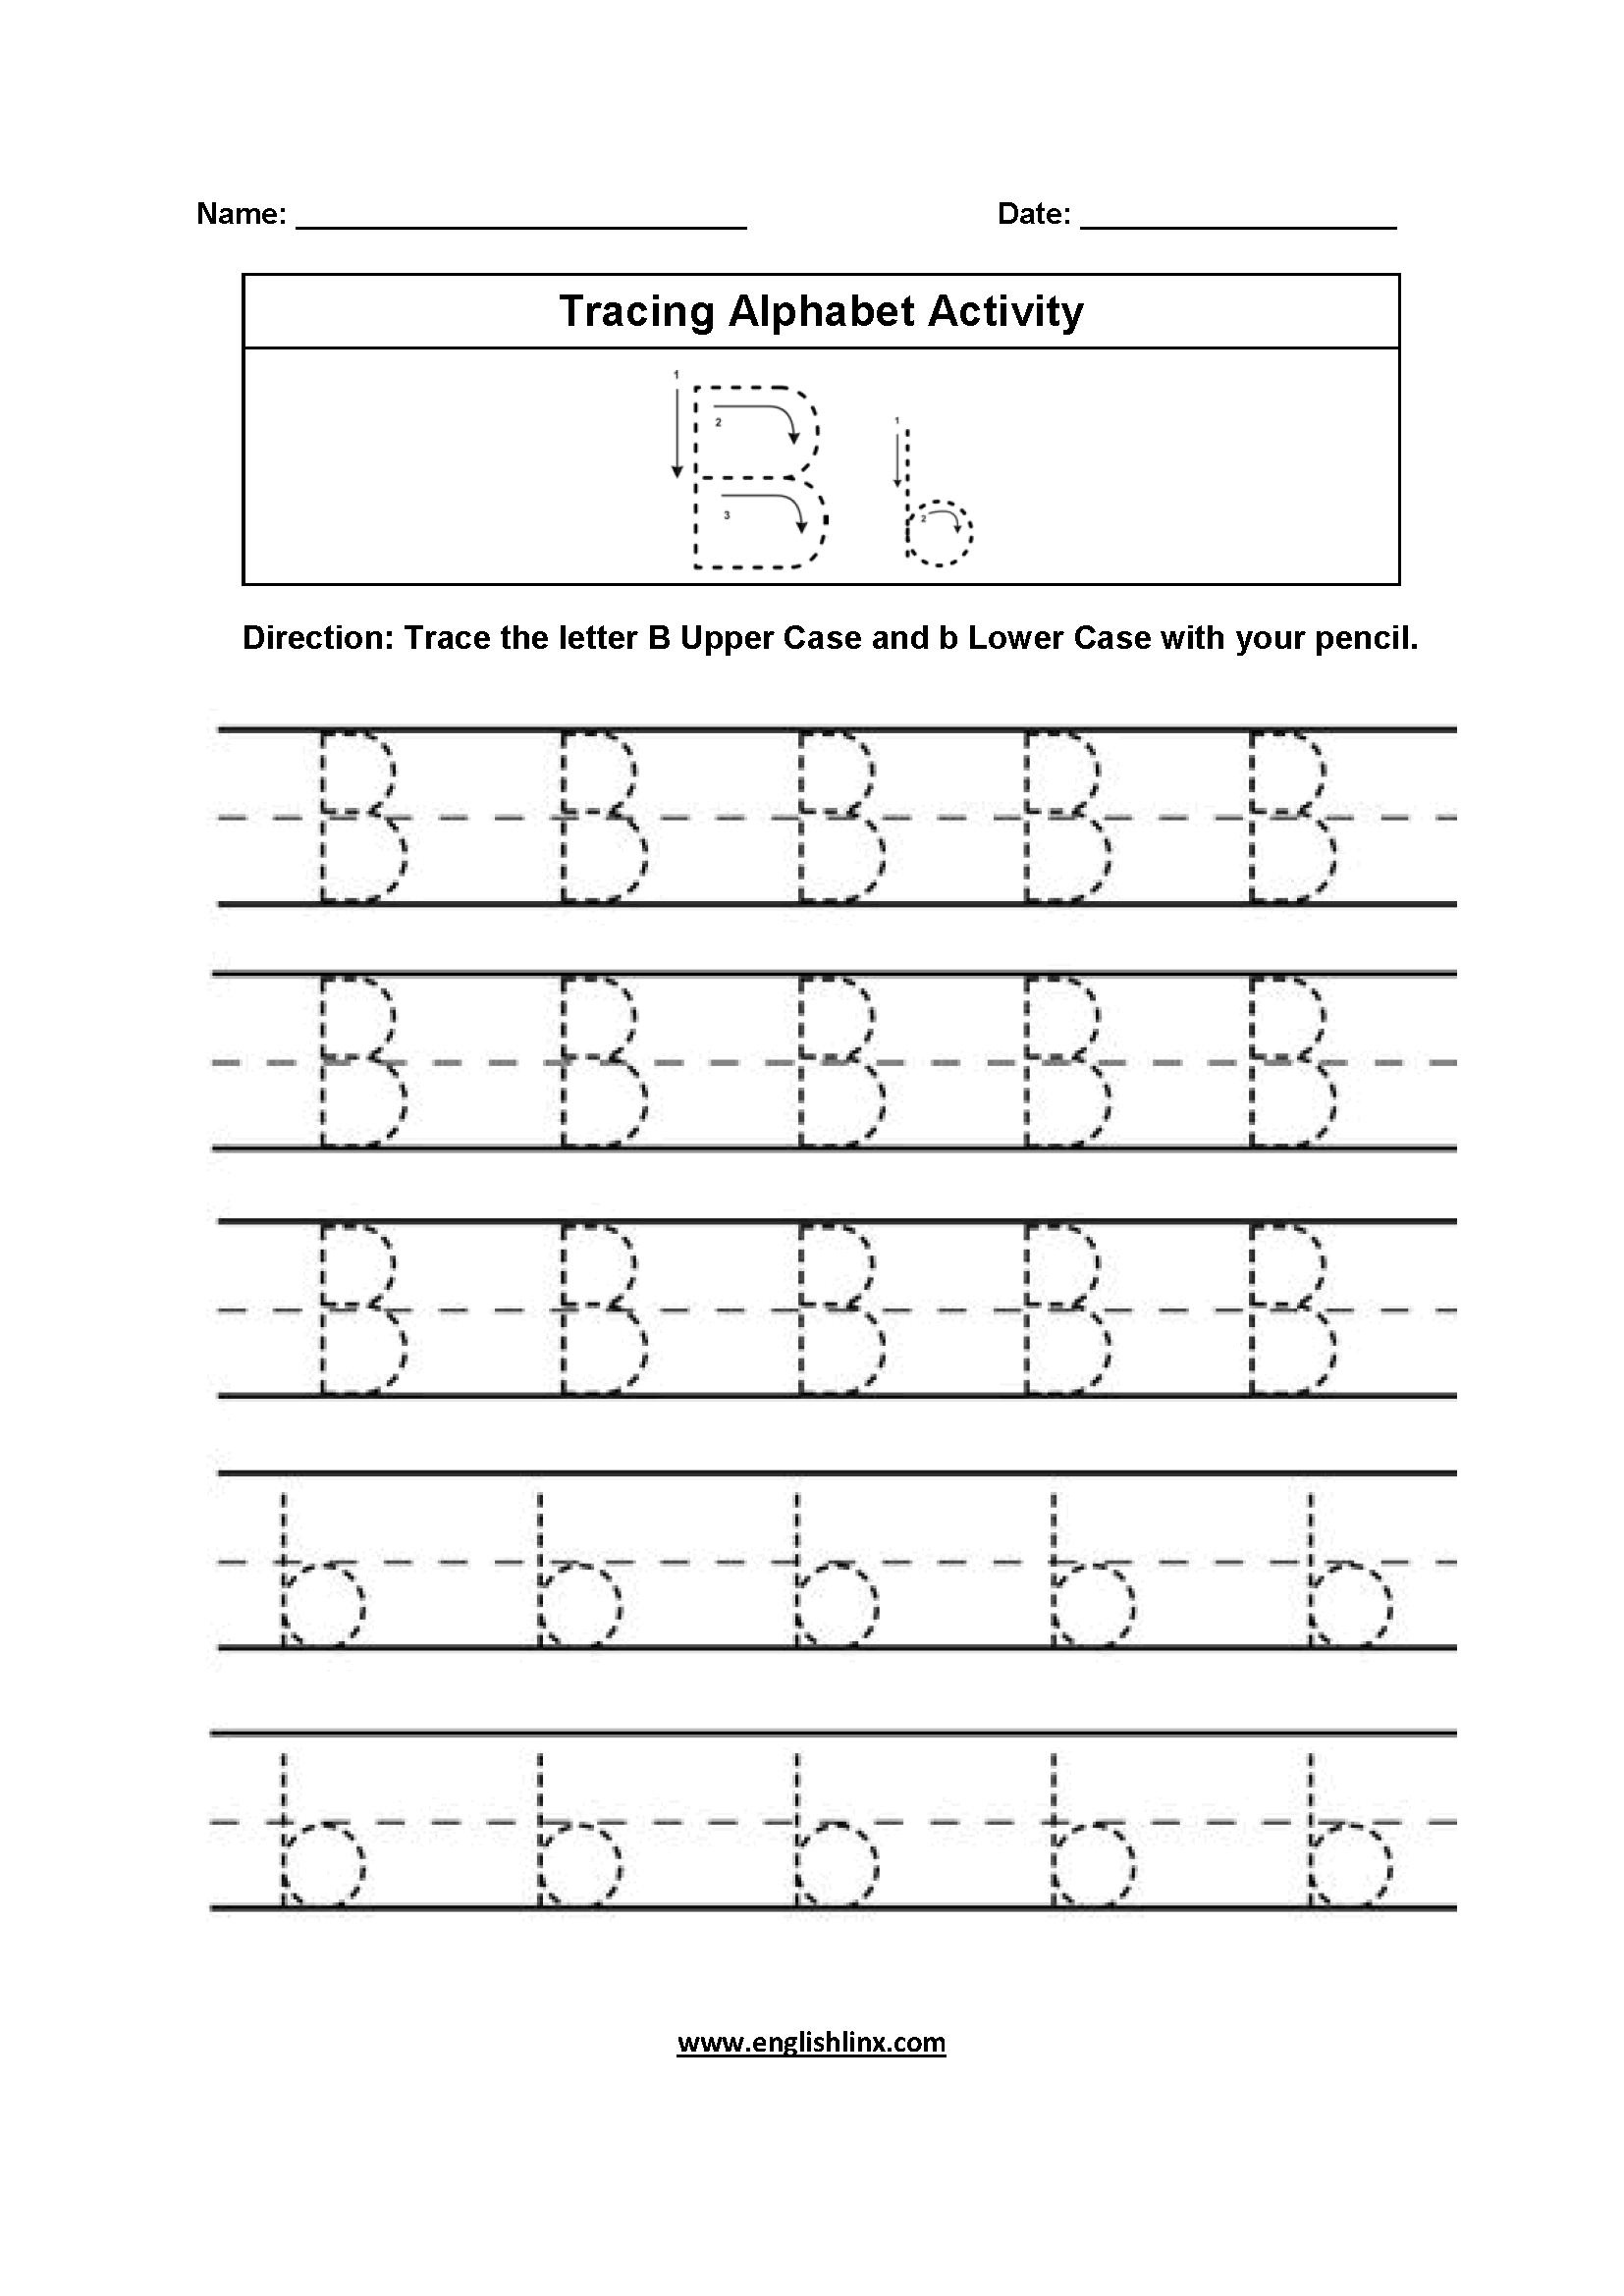 Cursive Writing Letter B Tracing Worksheet | Printable